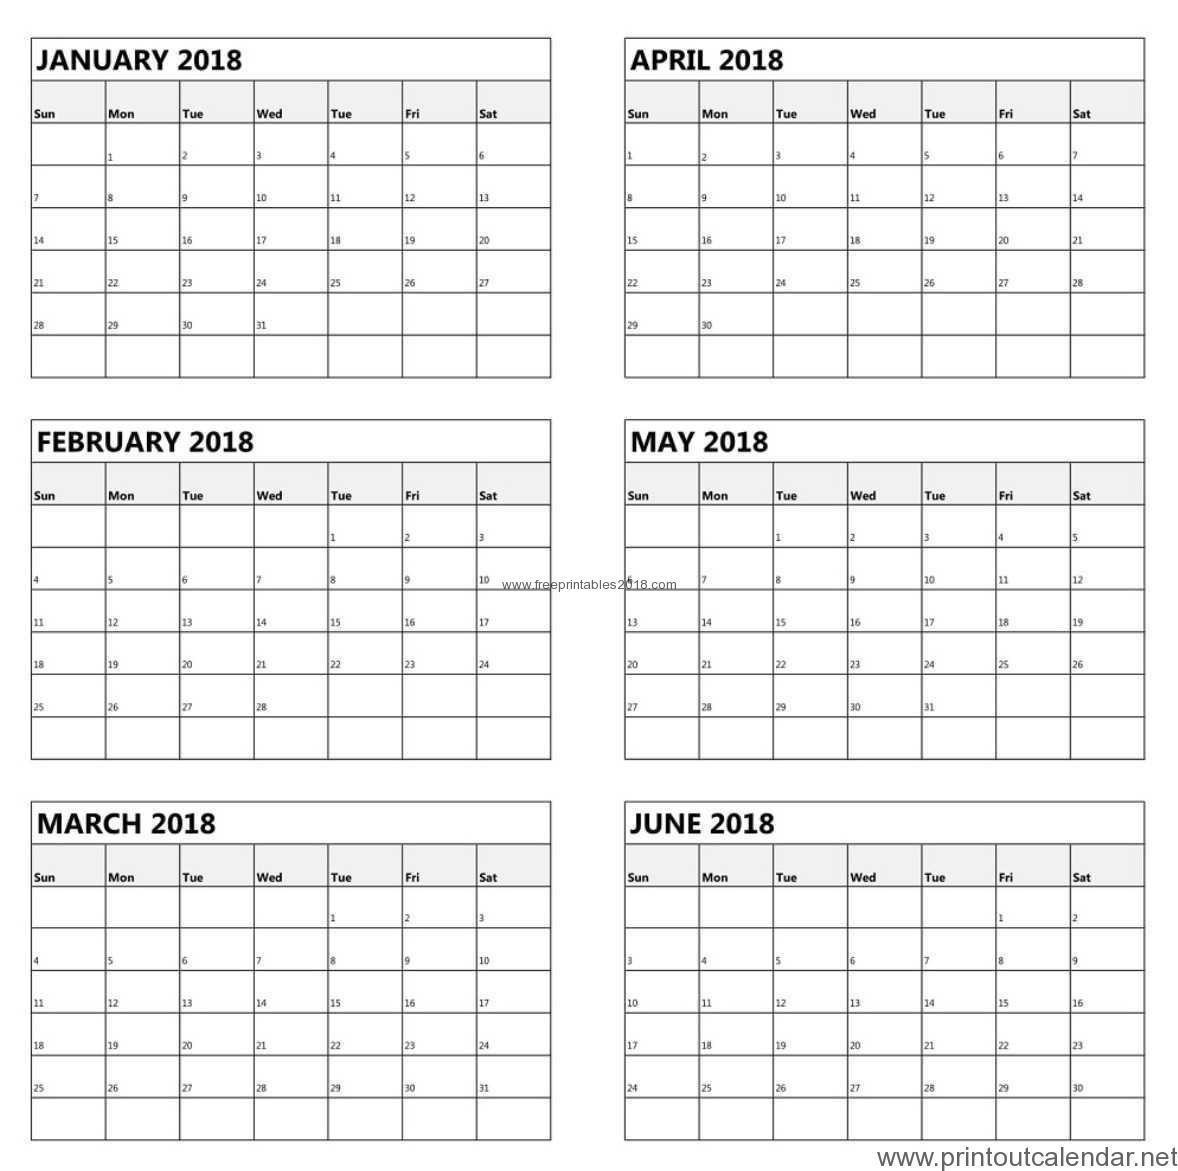 Printable Calendar 6 Month 2019 | Calendar Design Ideas-Print Blank Calendar 6 Months Per Page